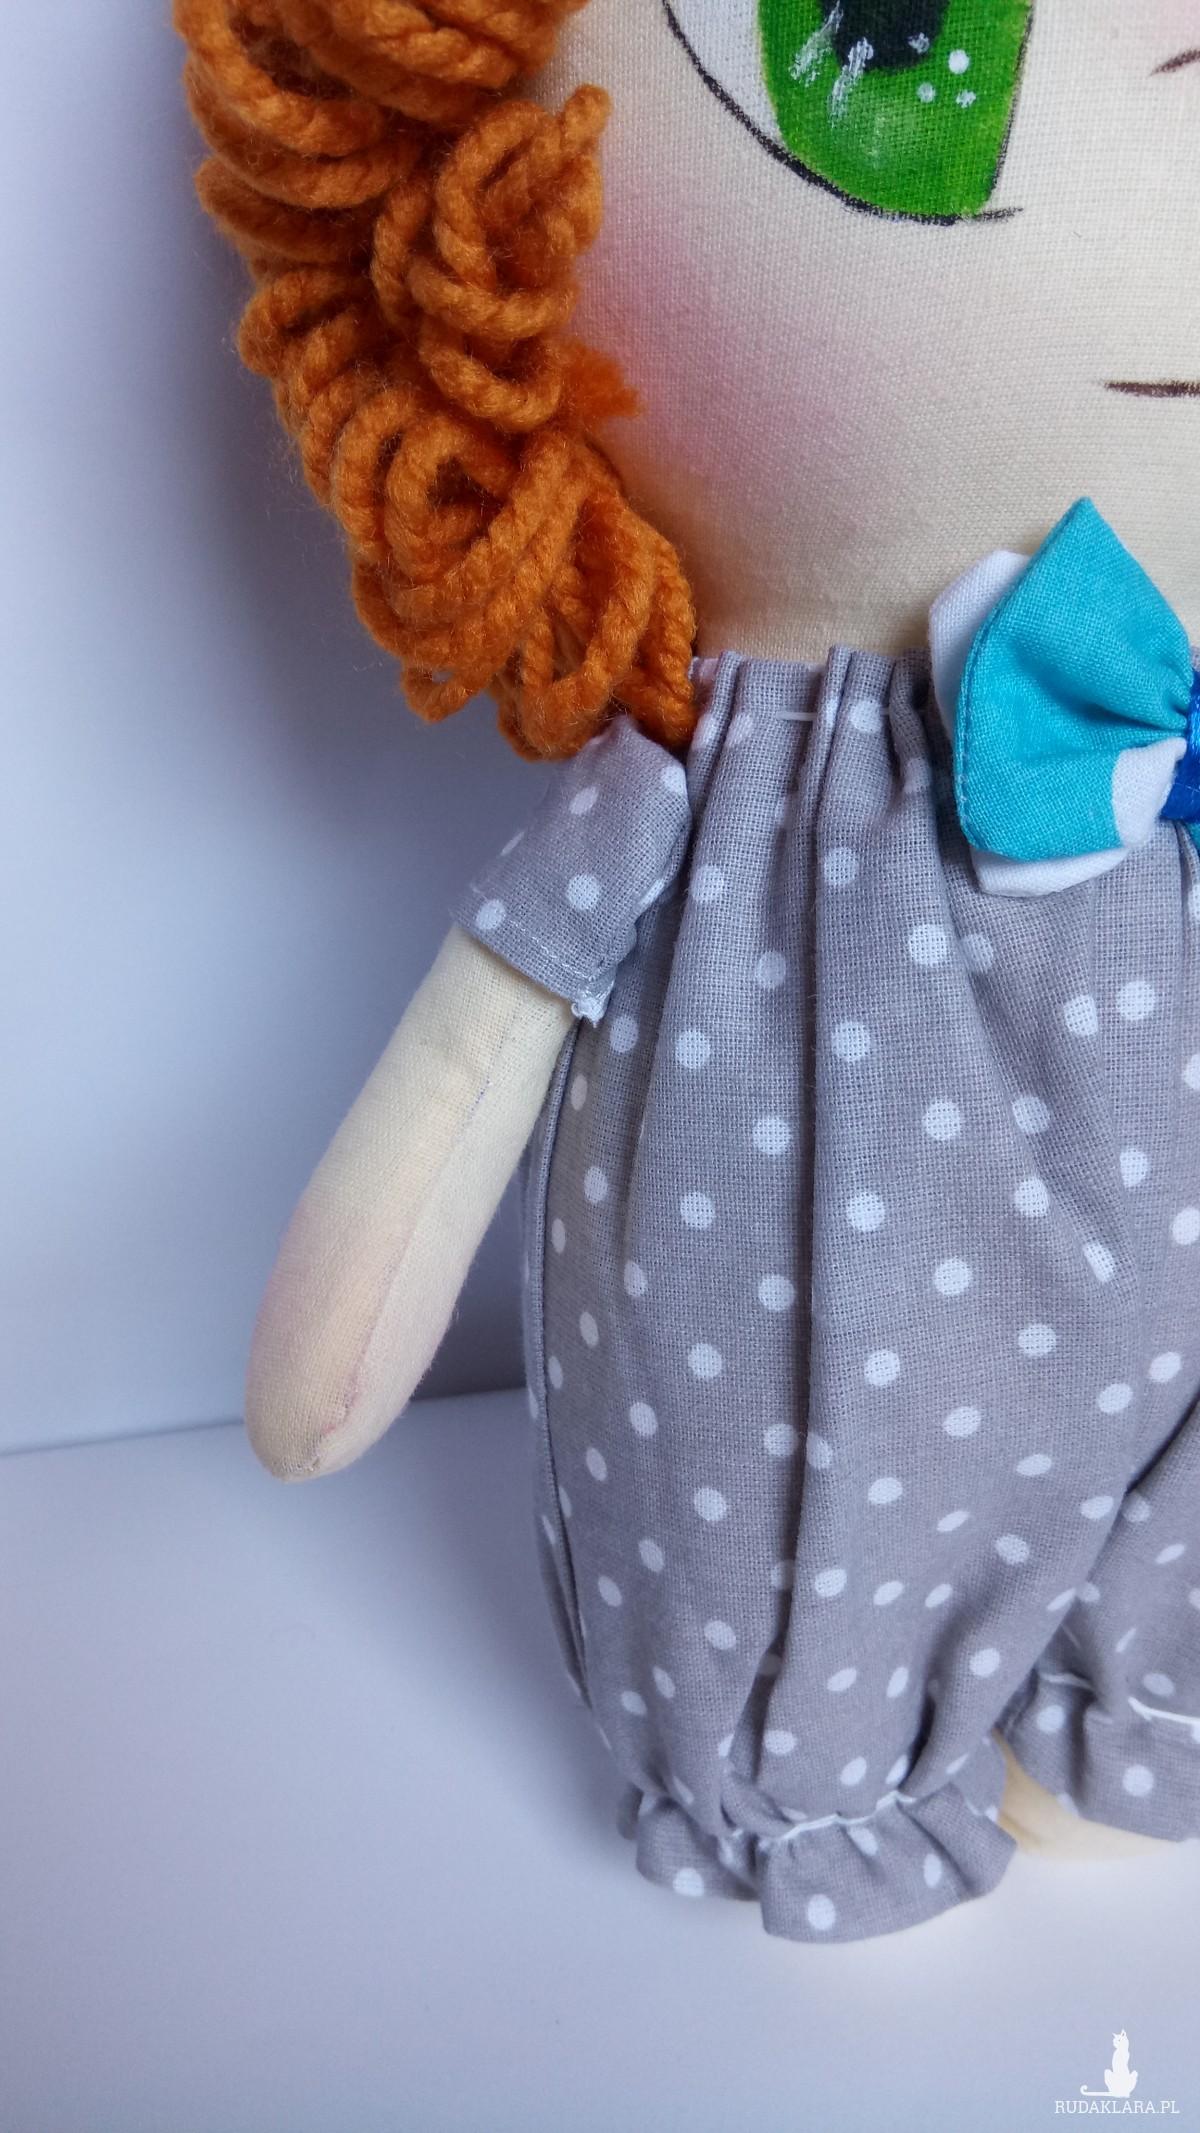 Lalka chłopiec w niebieskiej muszce